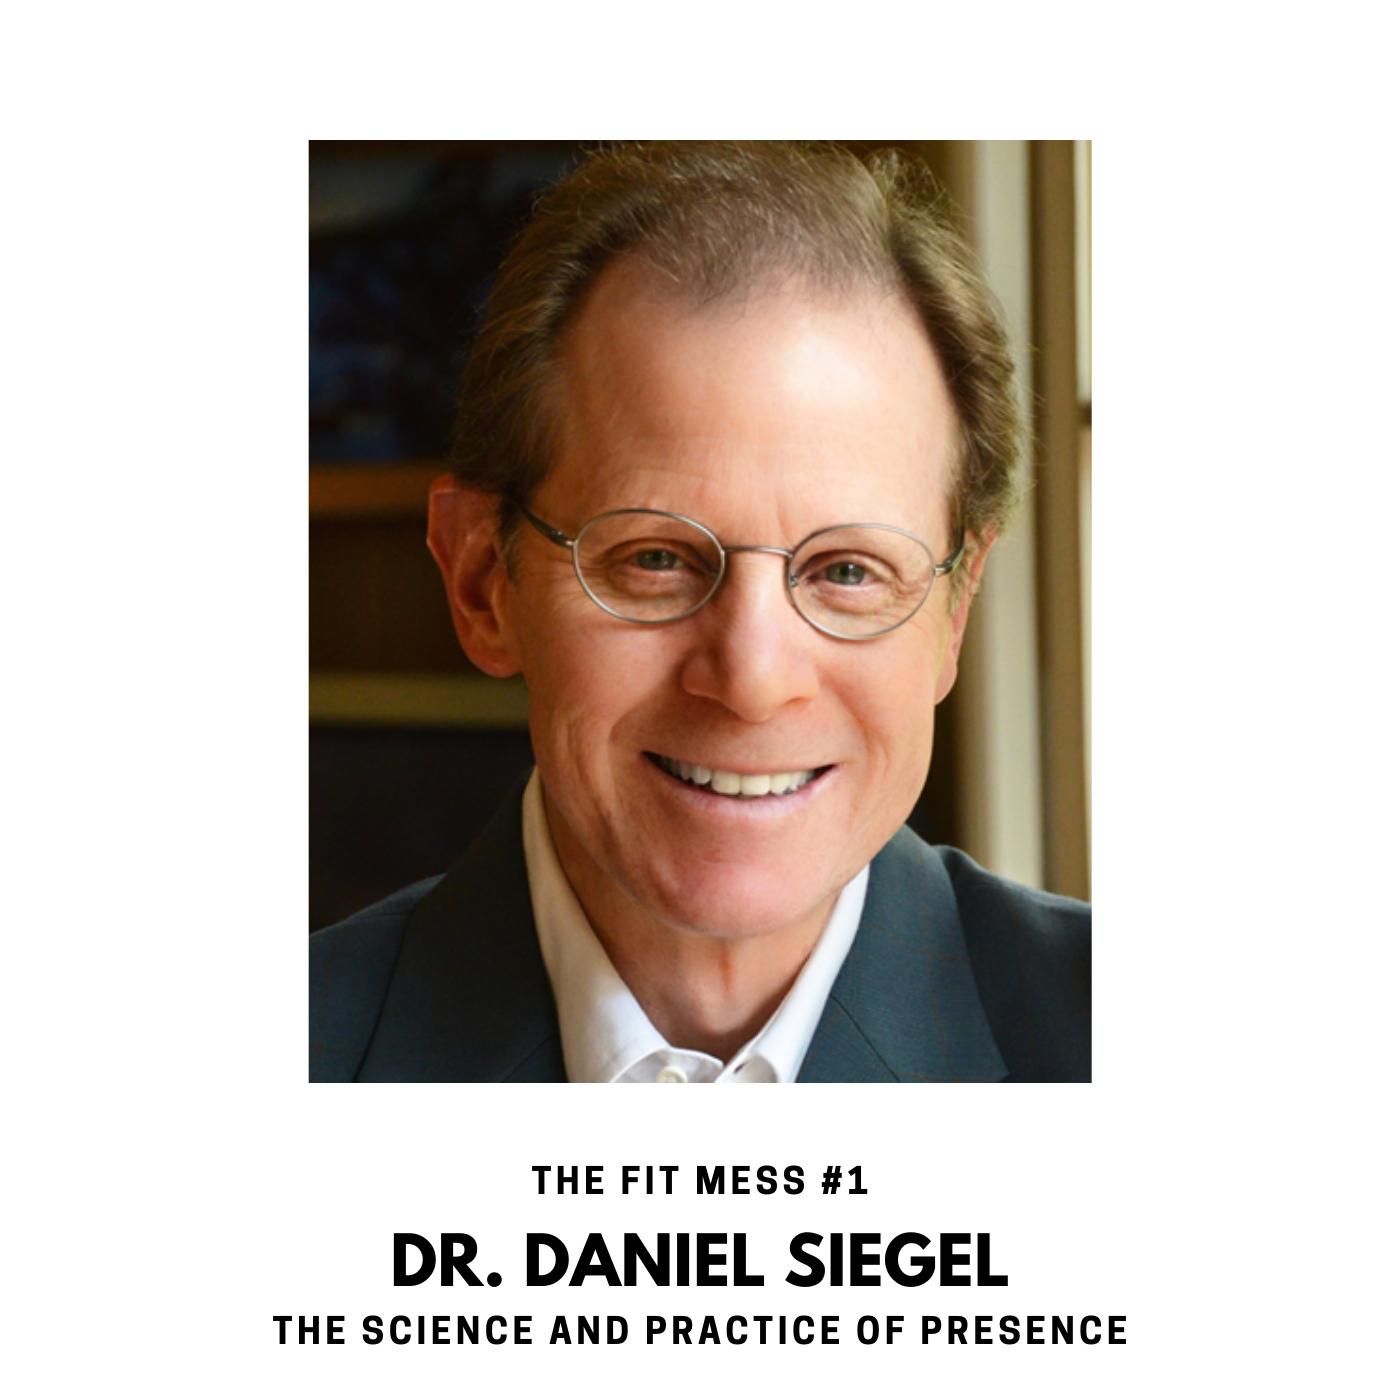 AWARE with Dr. Daniel Siegel